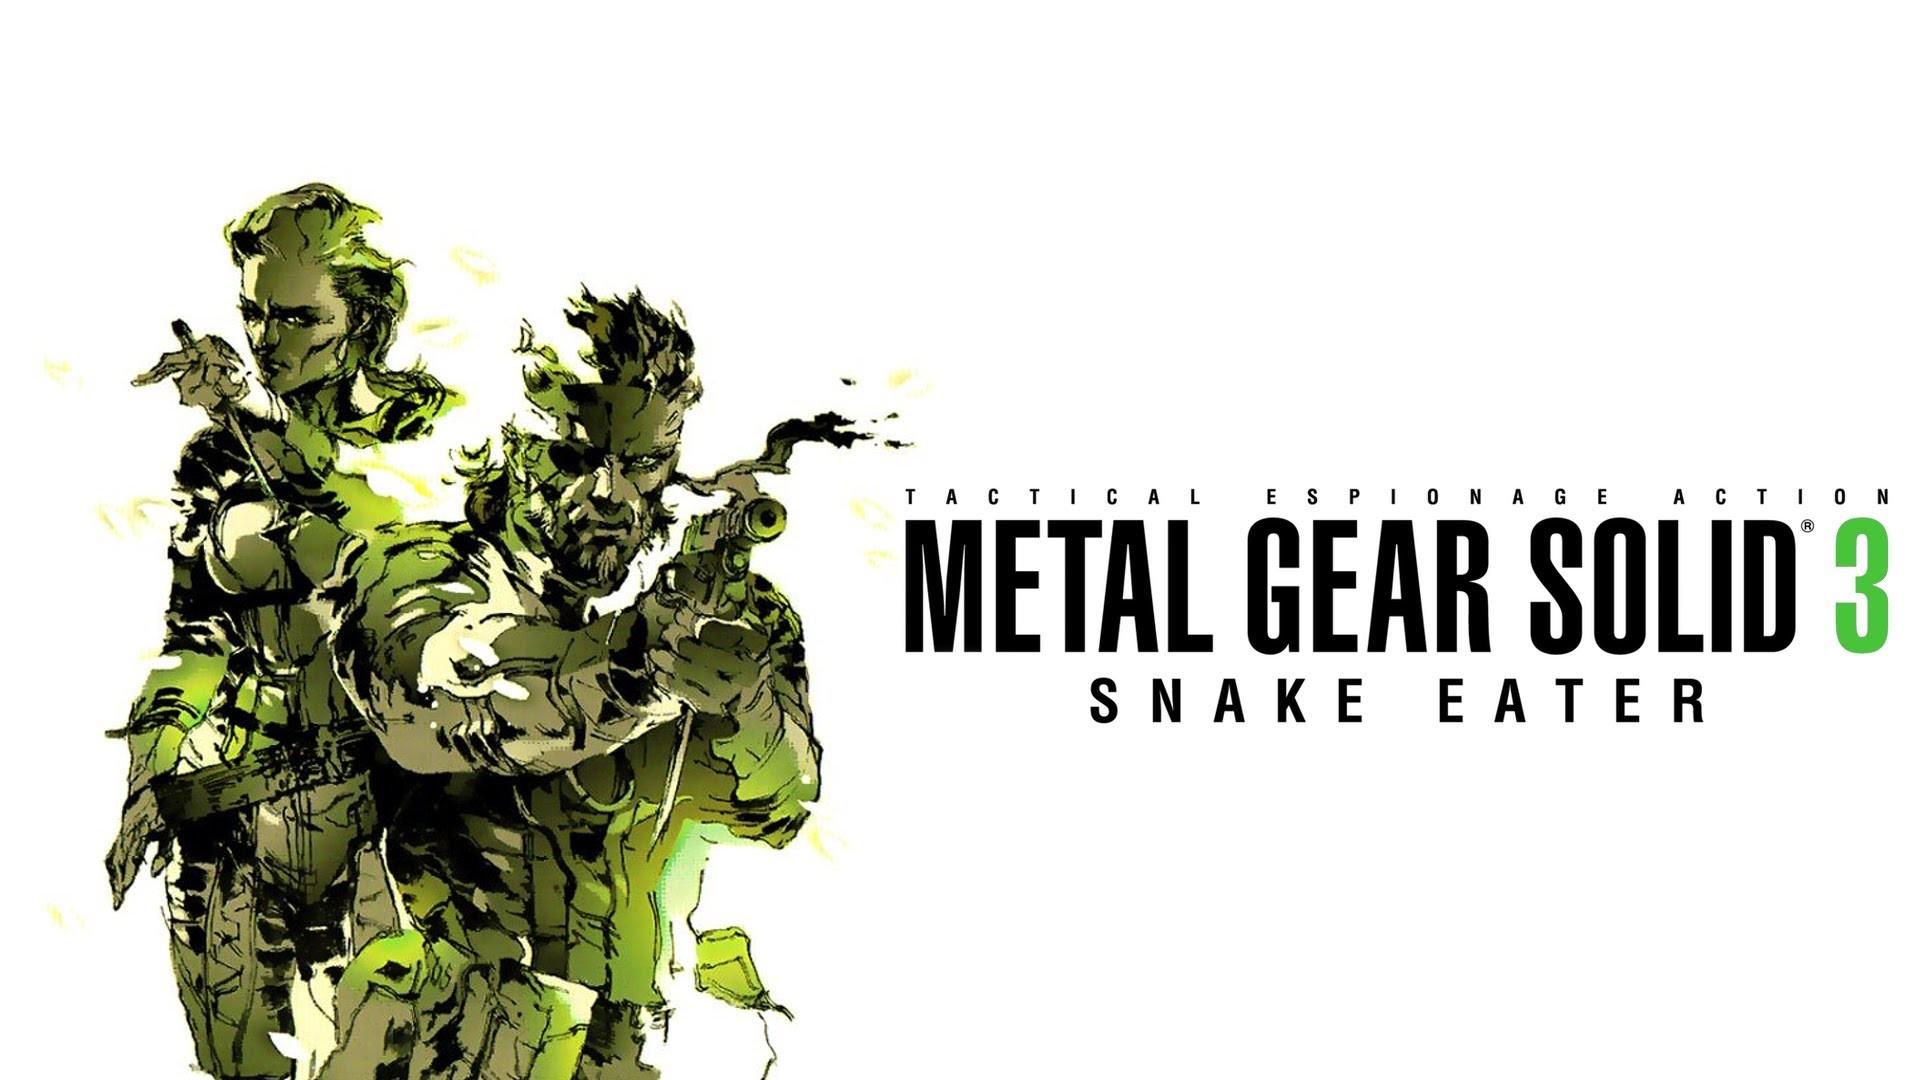 Metal Gear Solid 3 Wallpaper 1920x1080 73 Images